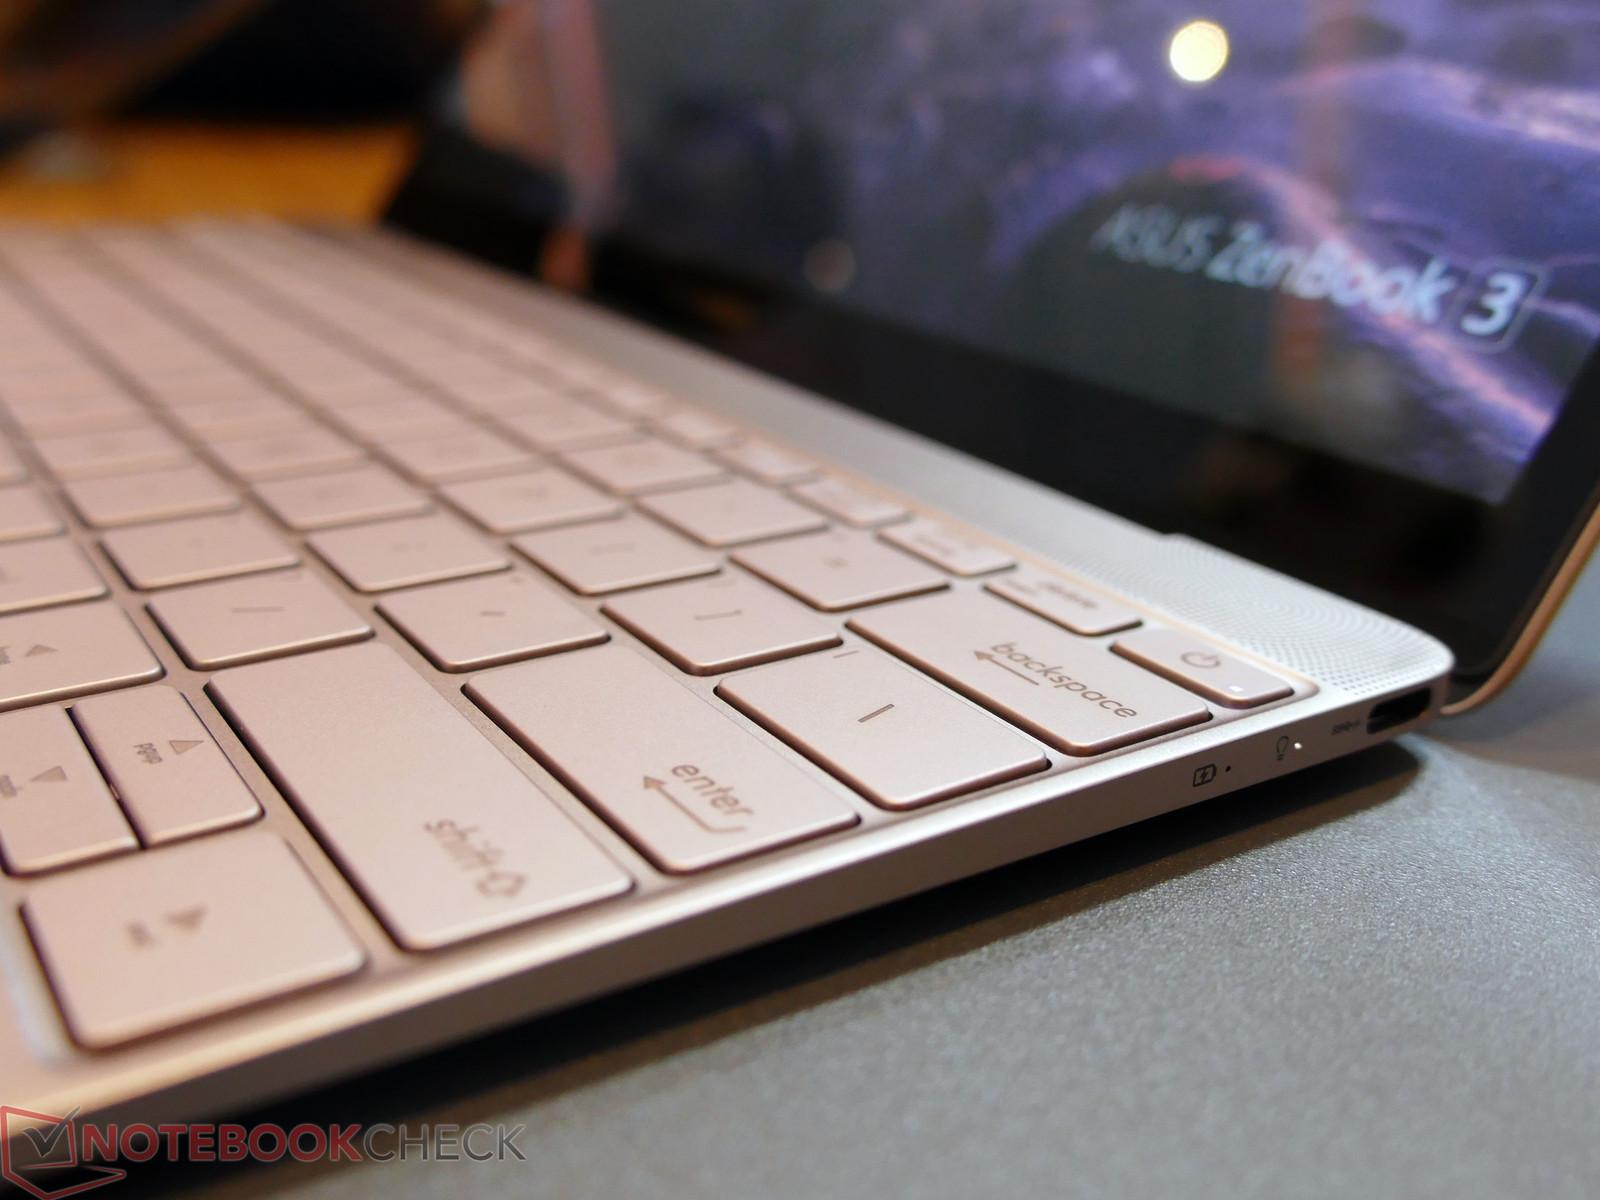 Asus Unveils Zenbook 3 Ultrabook Starting At 1000 Usd